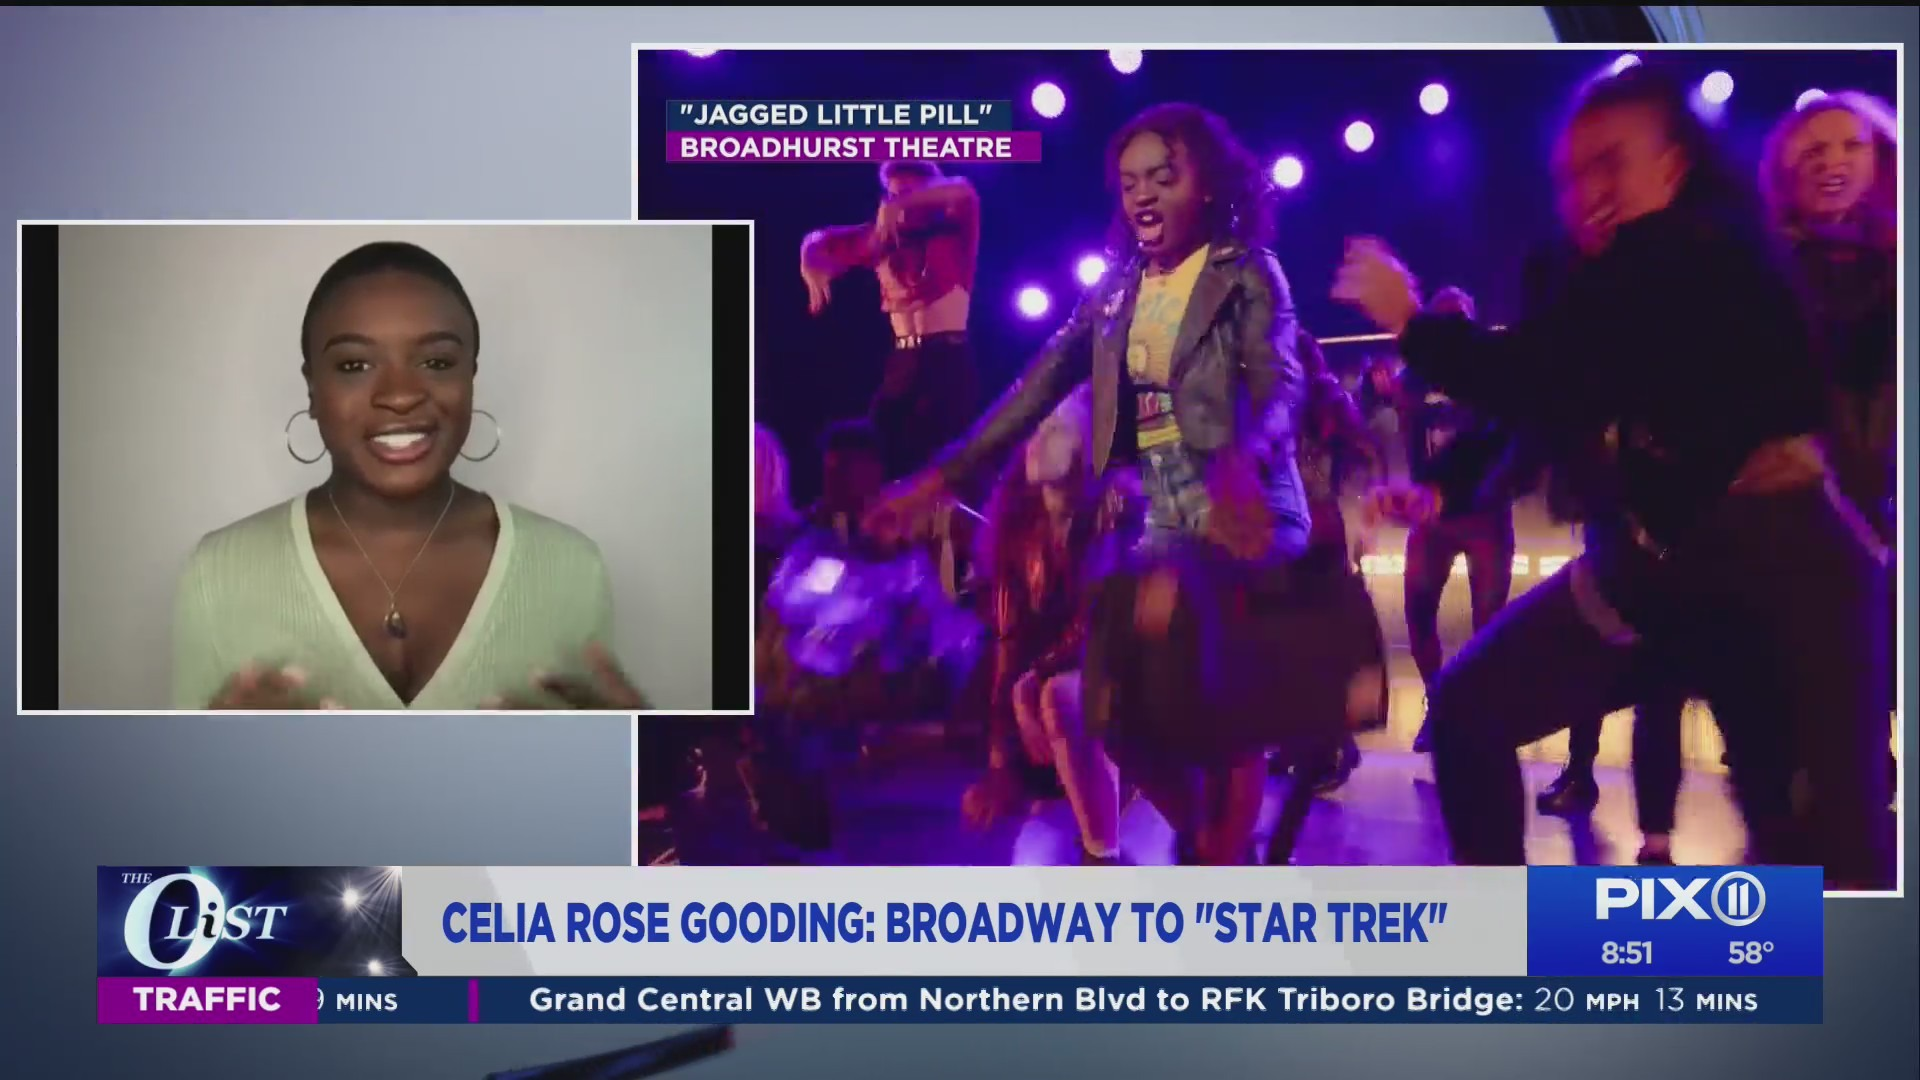 Celia Rose Gooding on PIX11